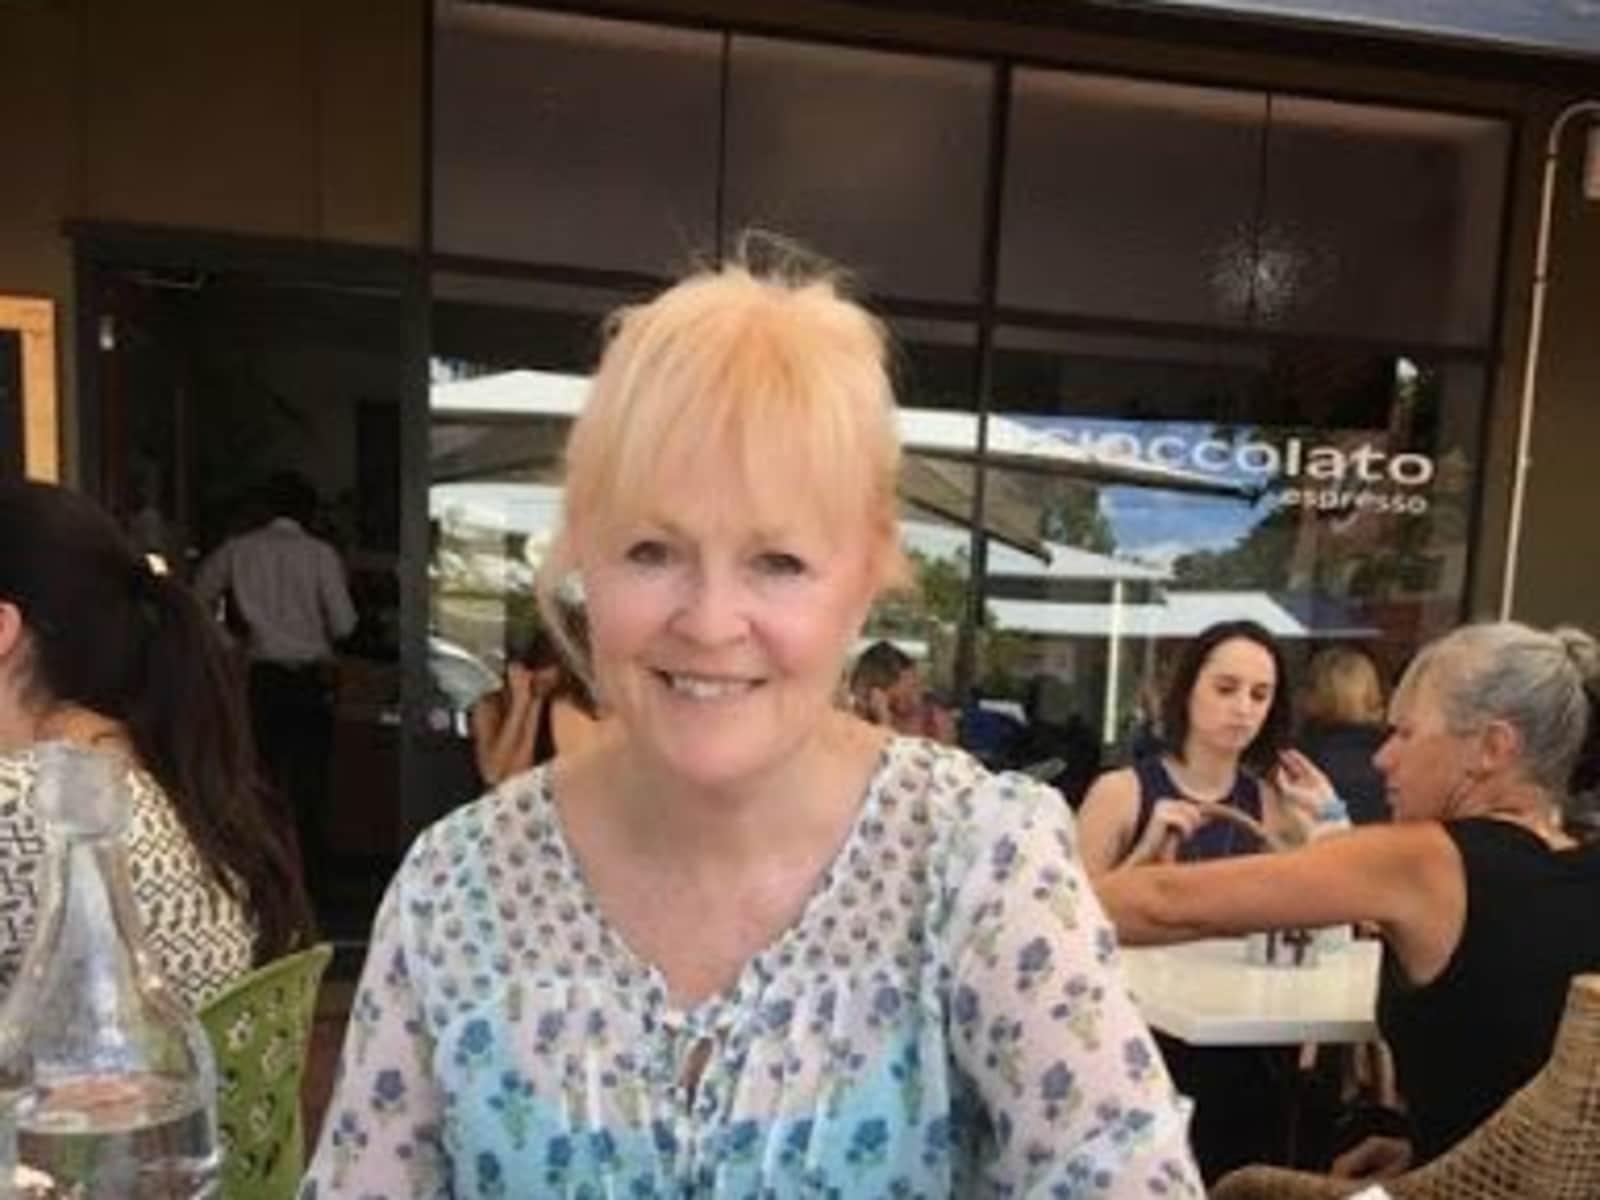 Christine from Australia